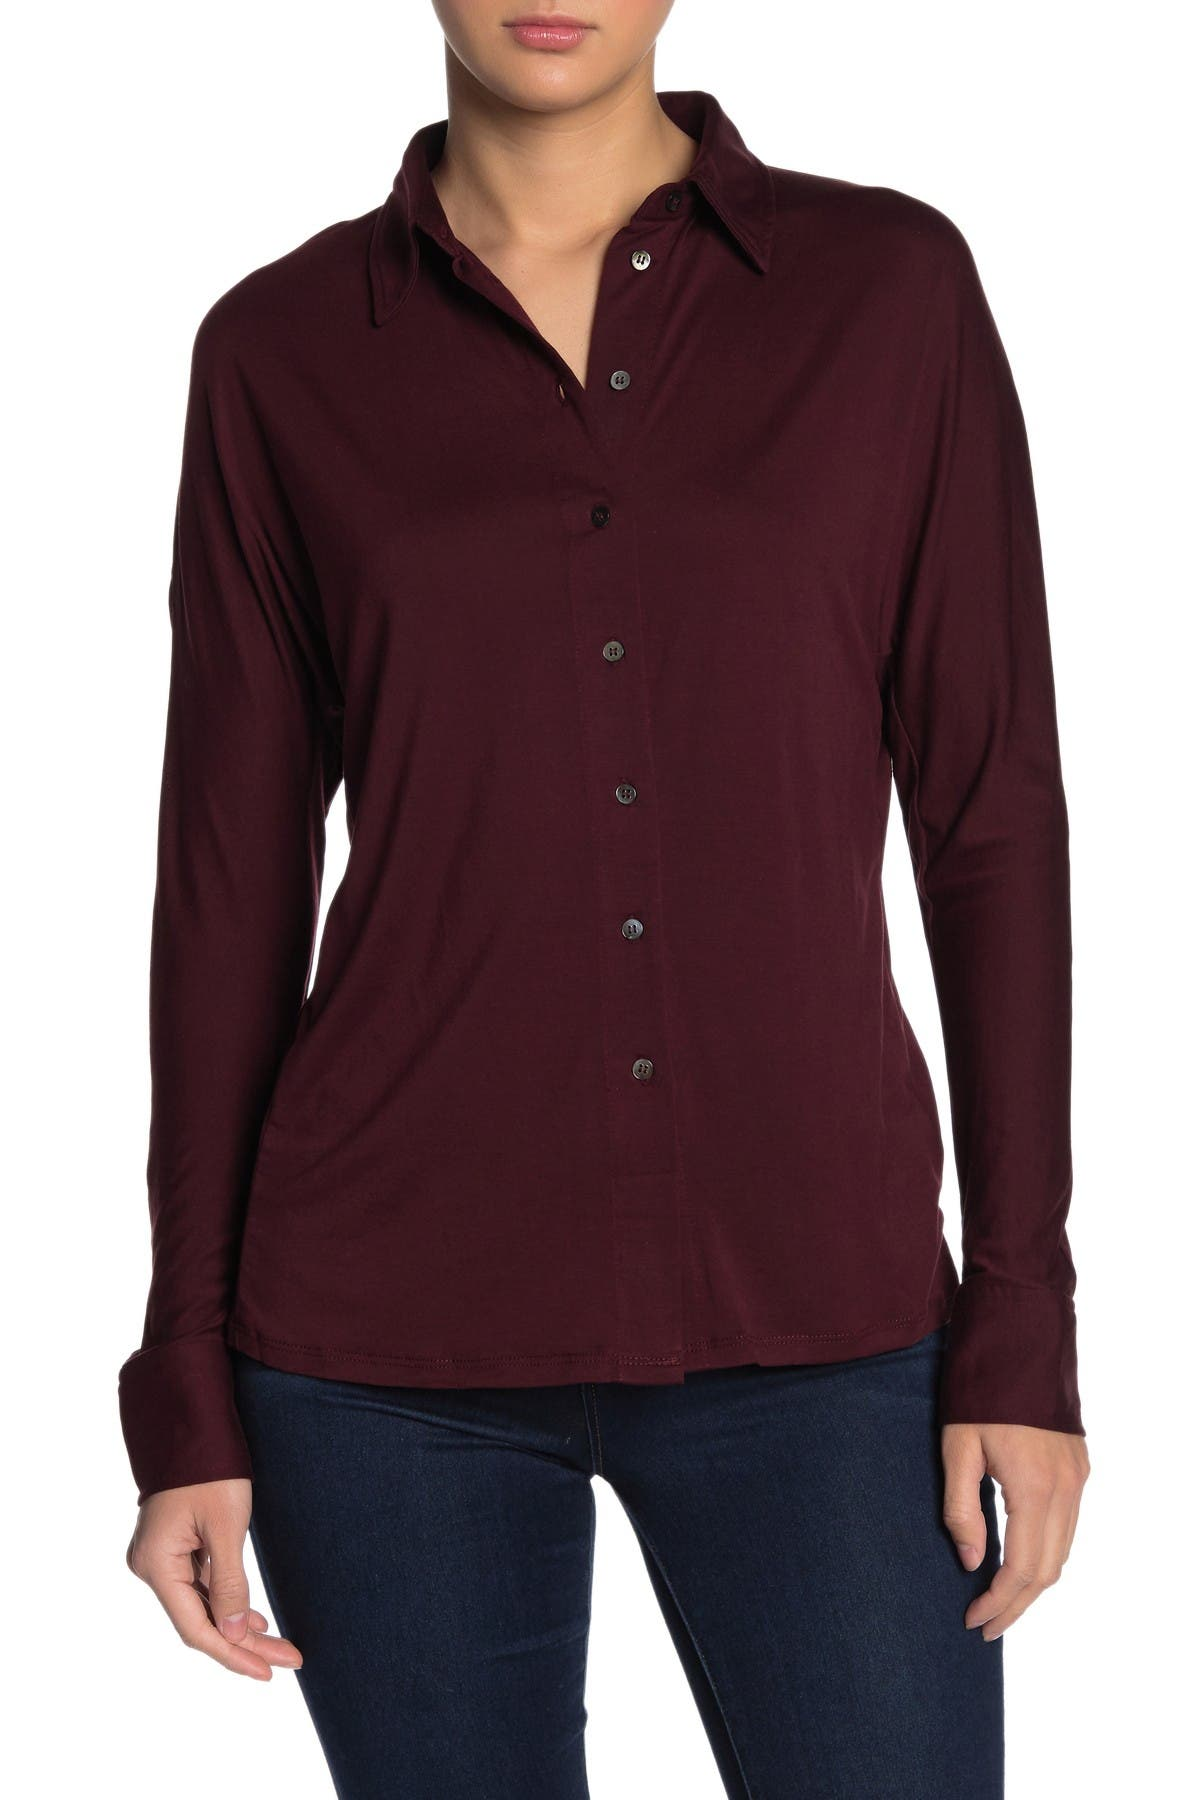 Image of Dress Forum Soft Button Front Shirt